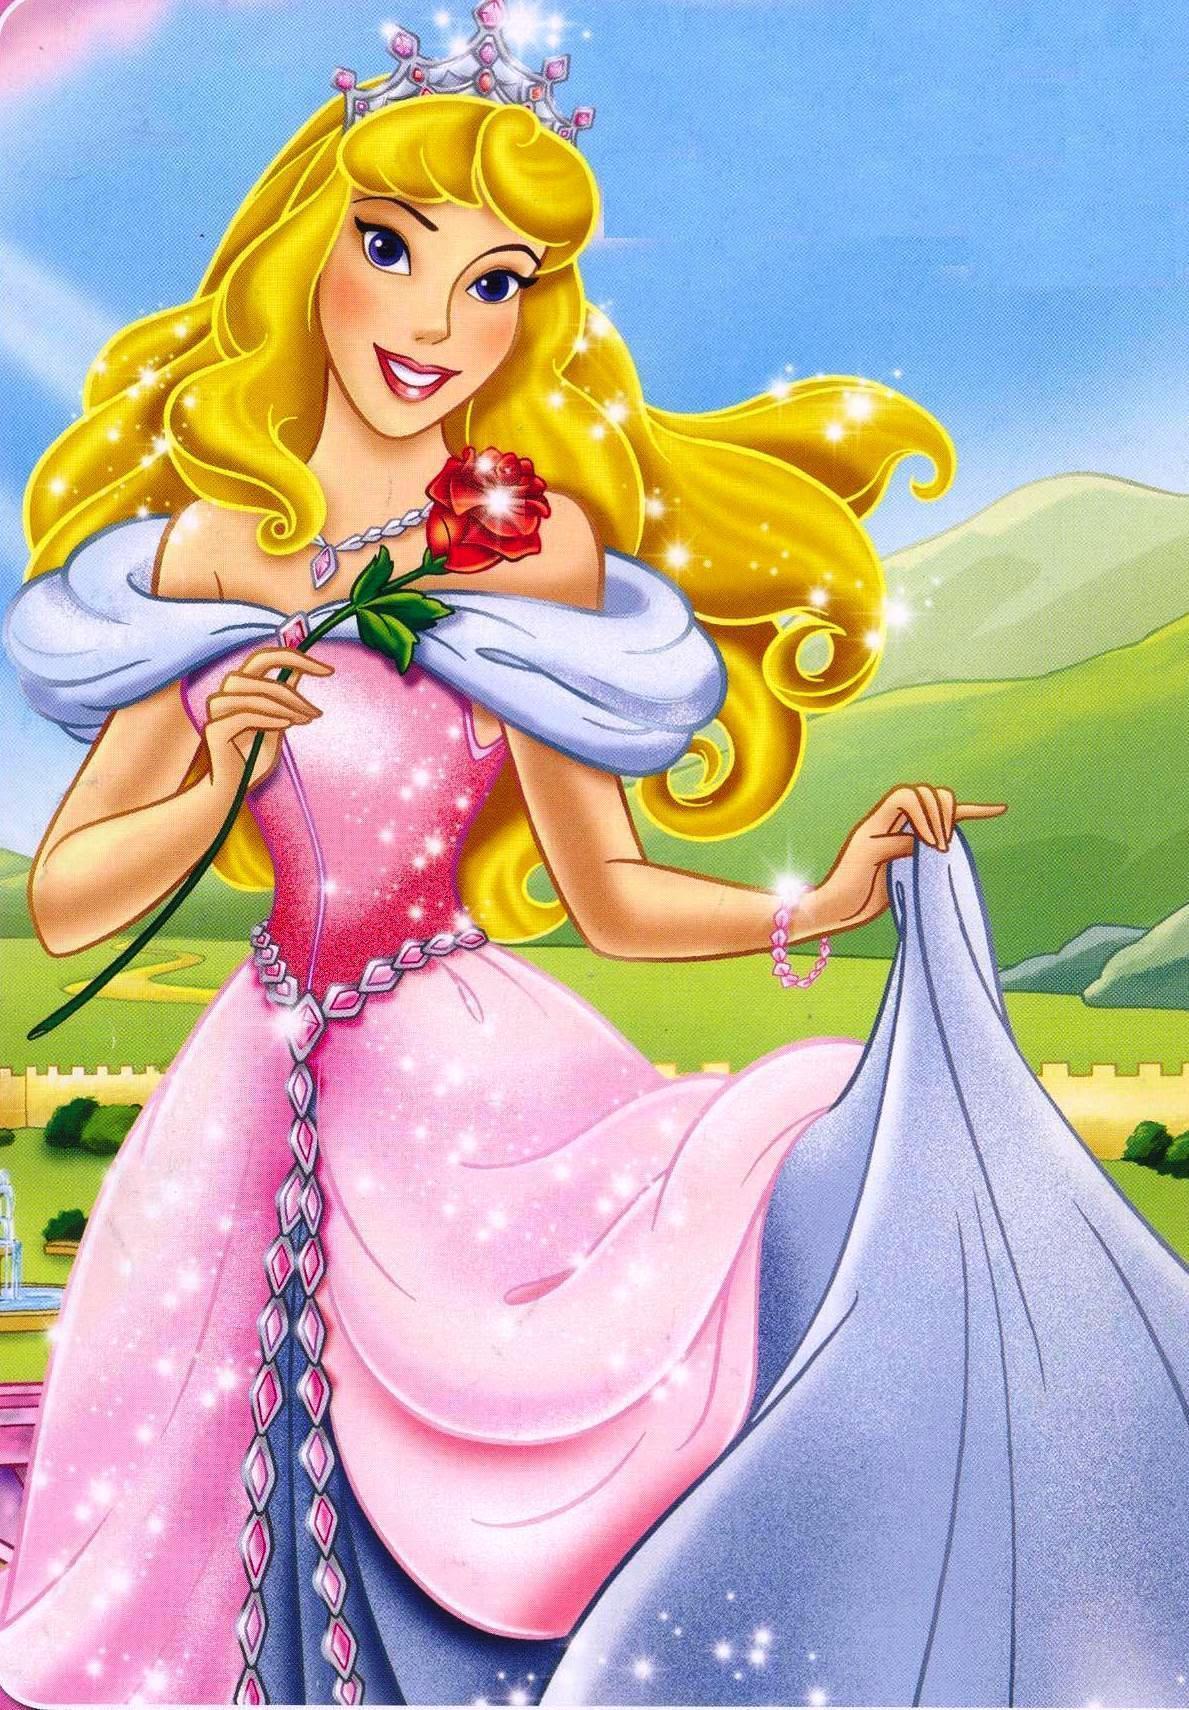 Princess Aurora - Disney Princess Photo (6332949) - Fanpop